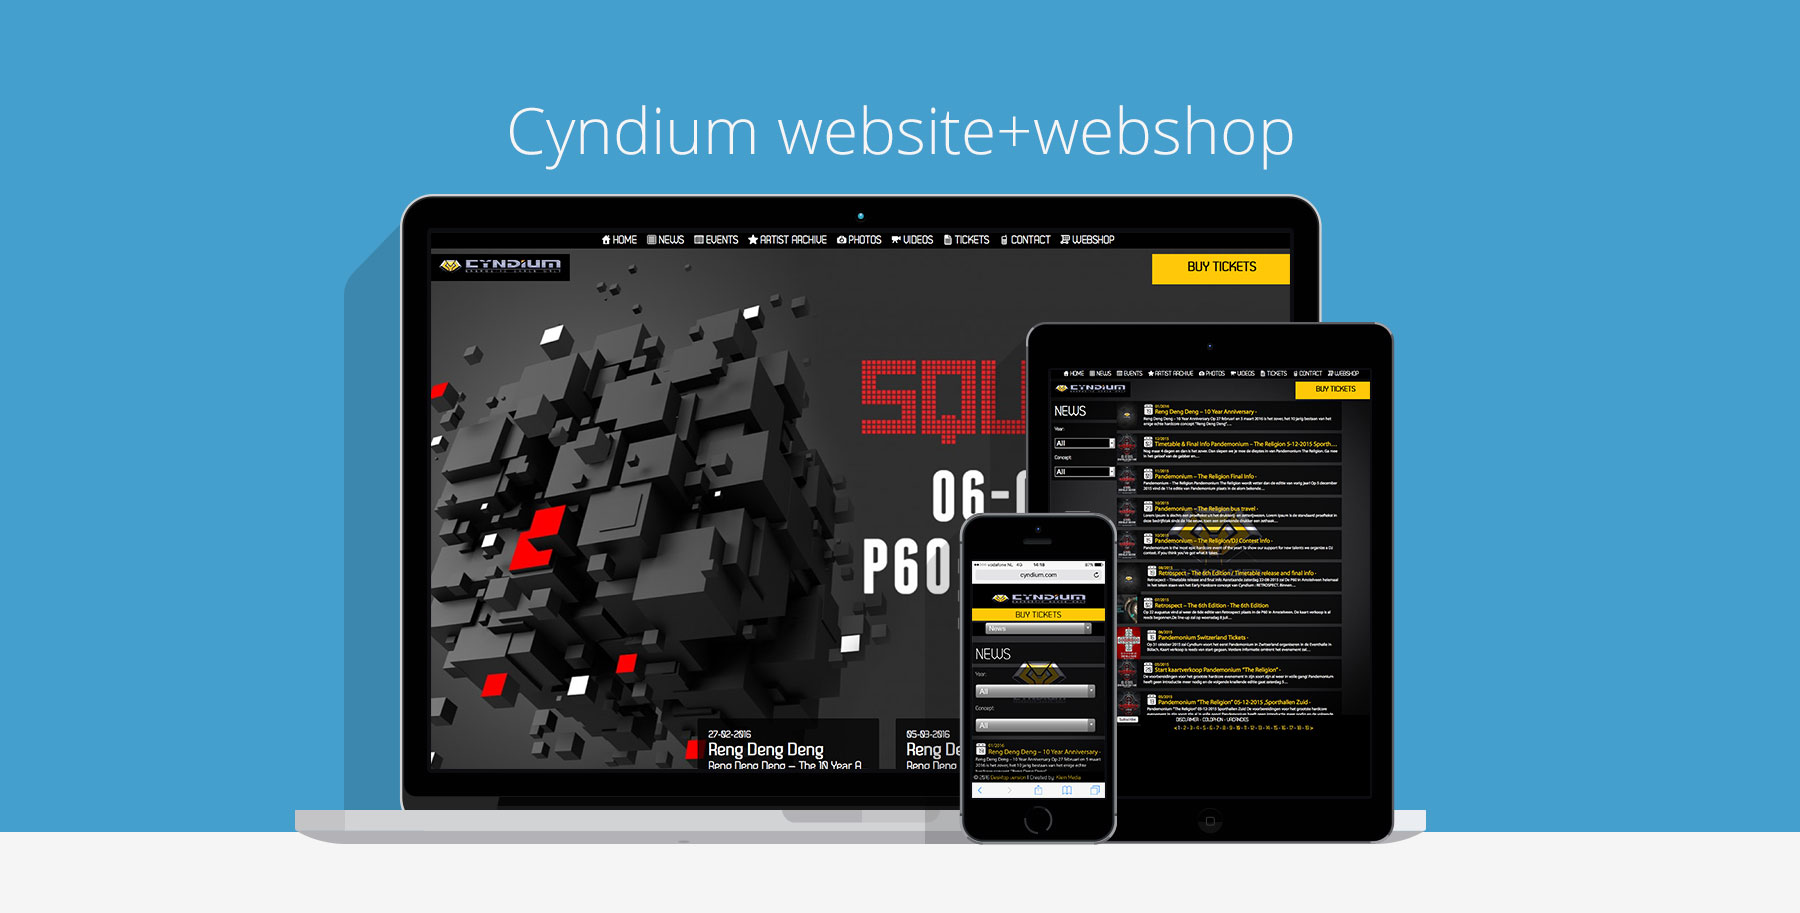 Cyndium events website webshop